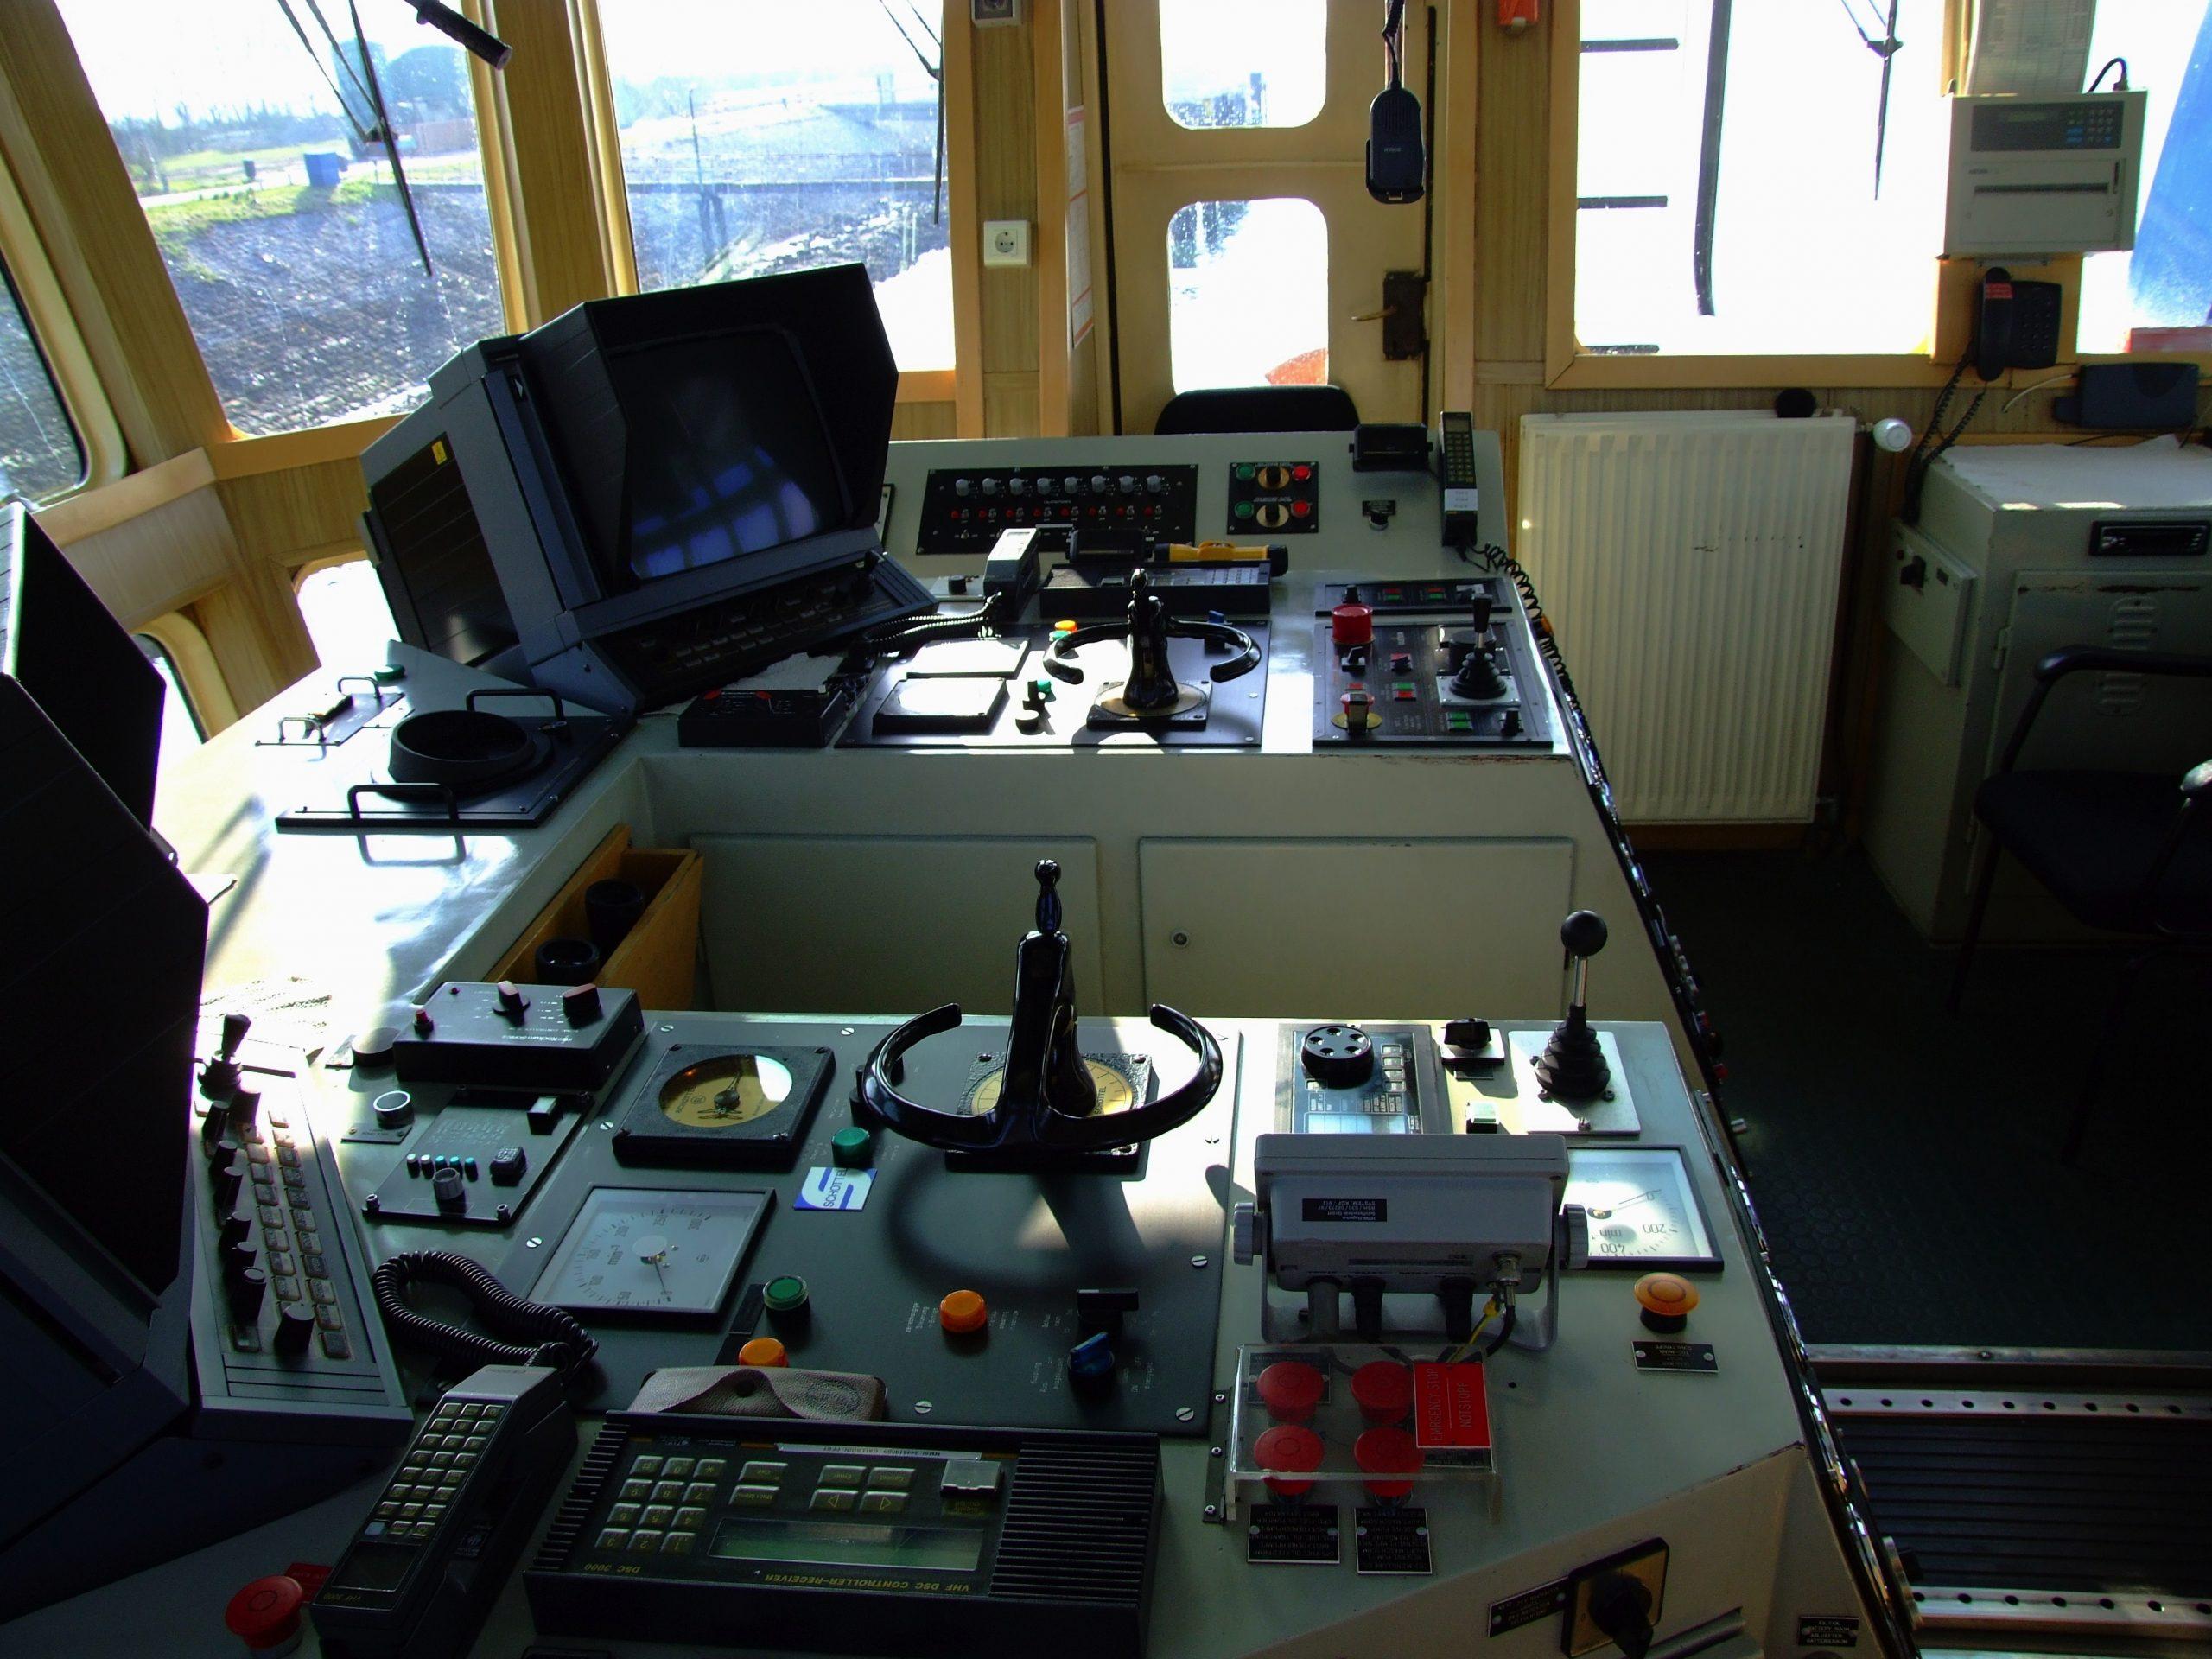 technology boat interior ship machine cockpit 1136269 pxhere com